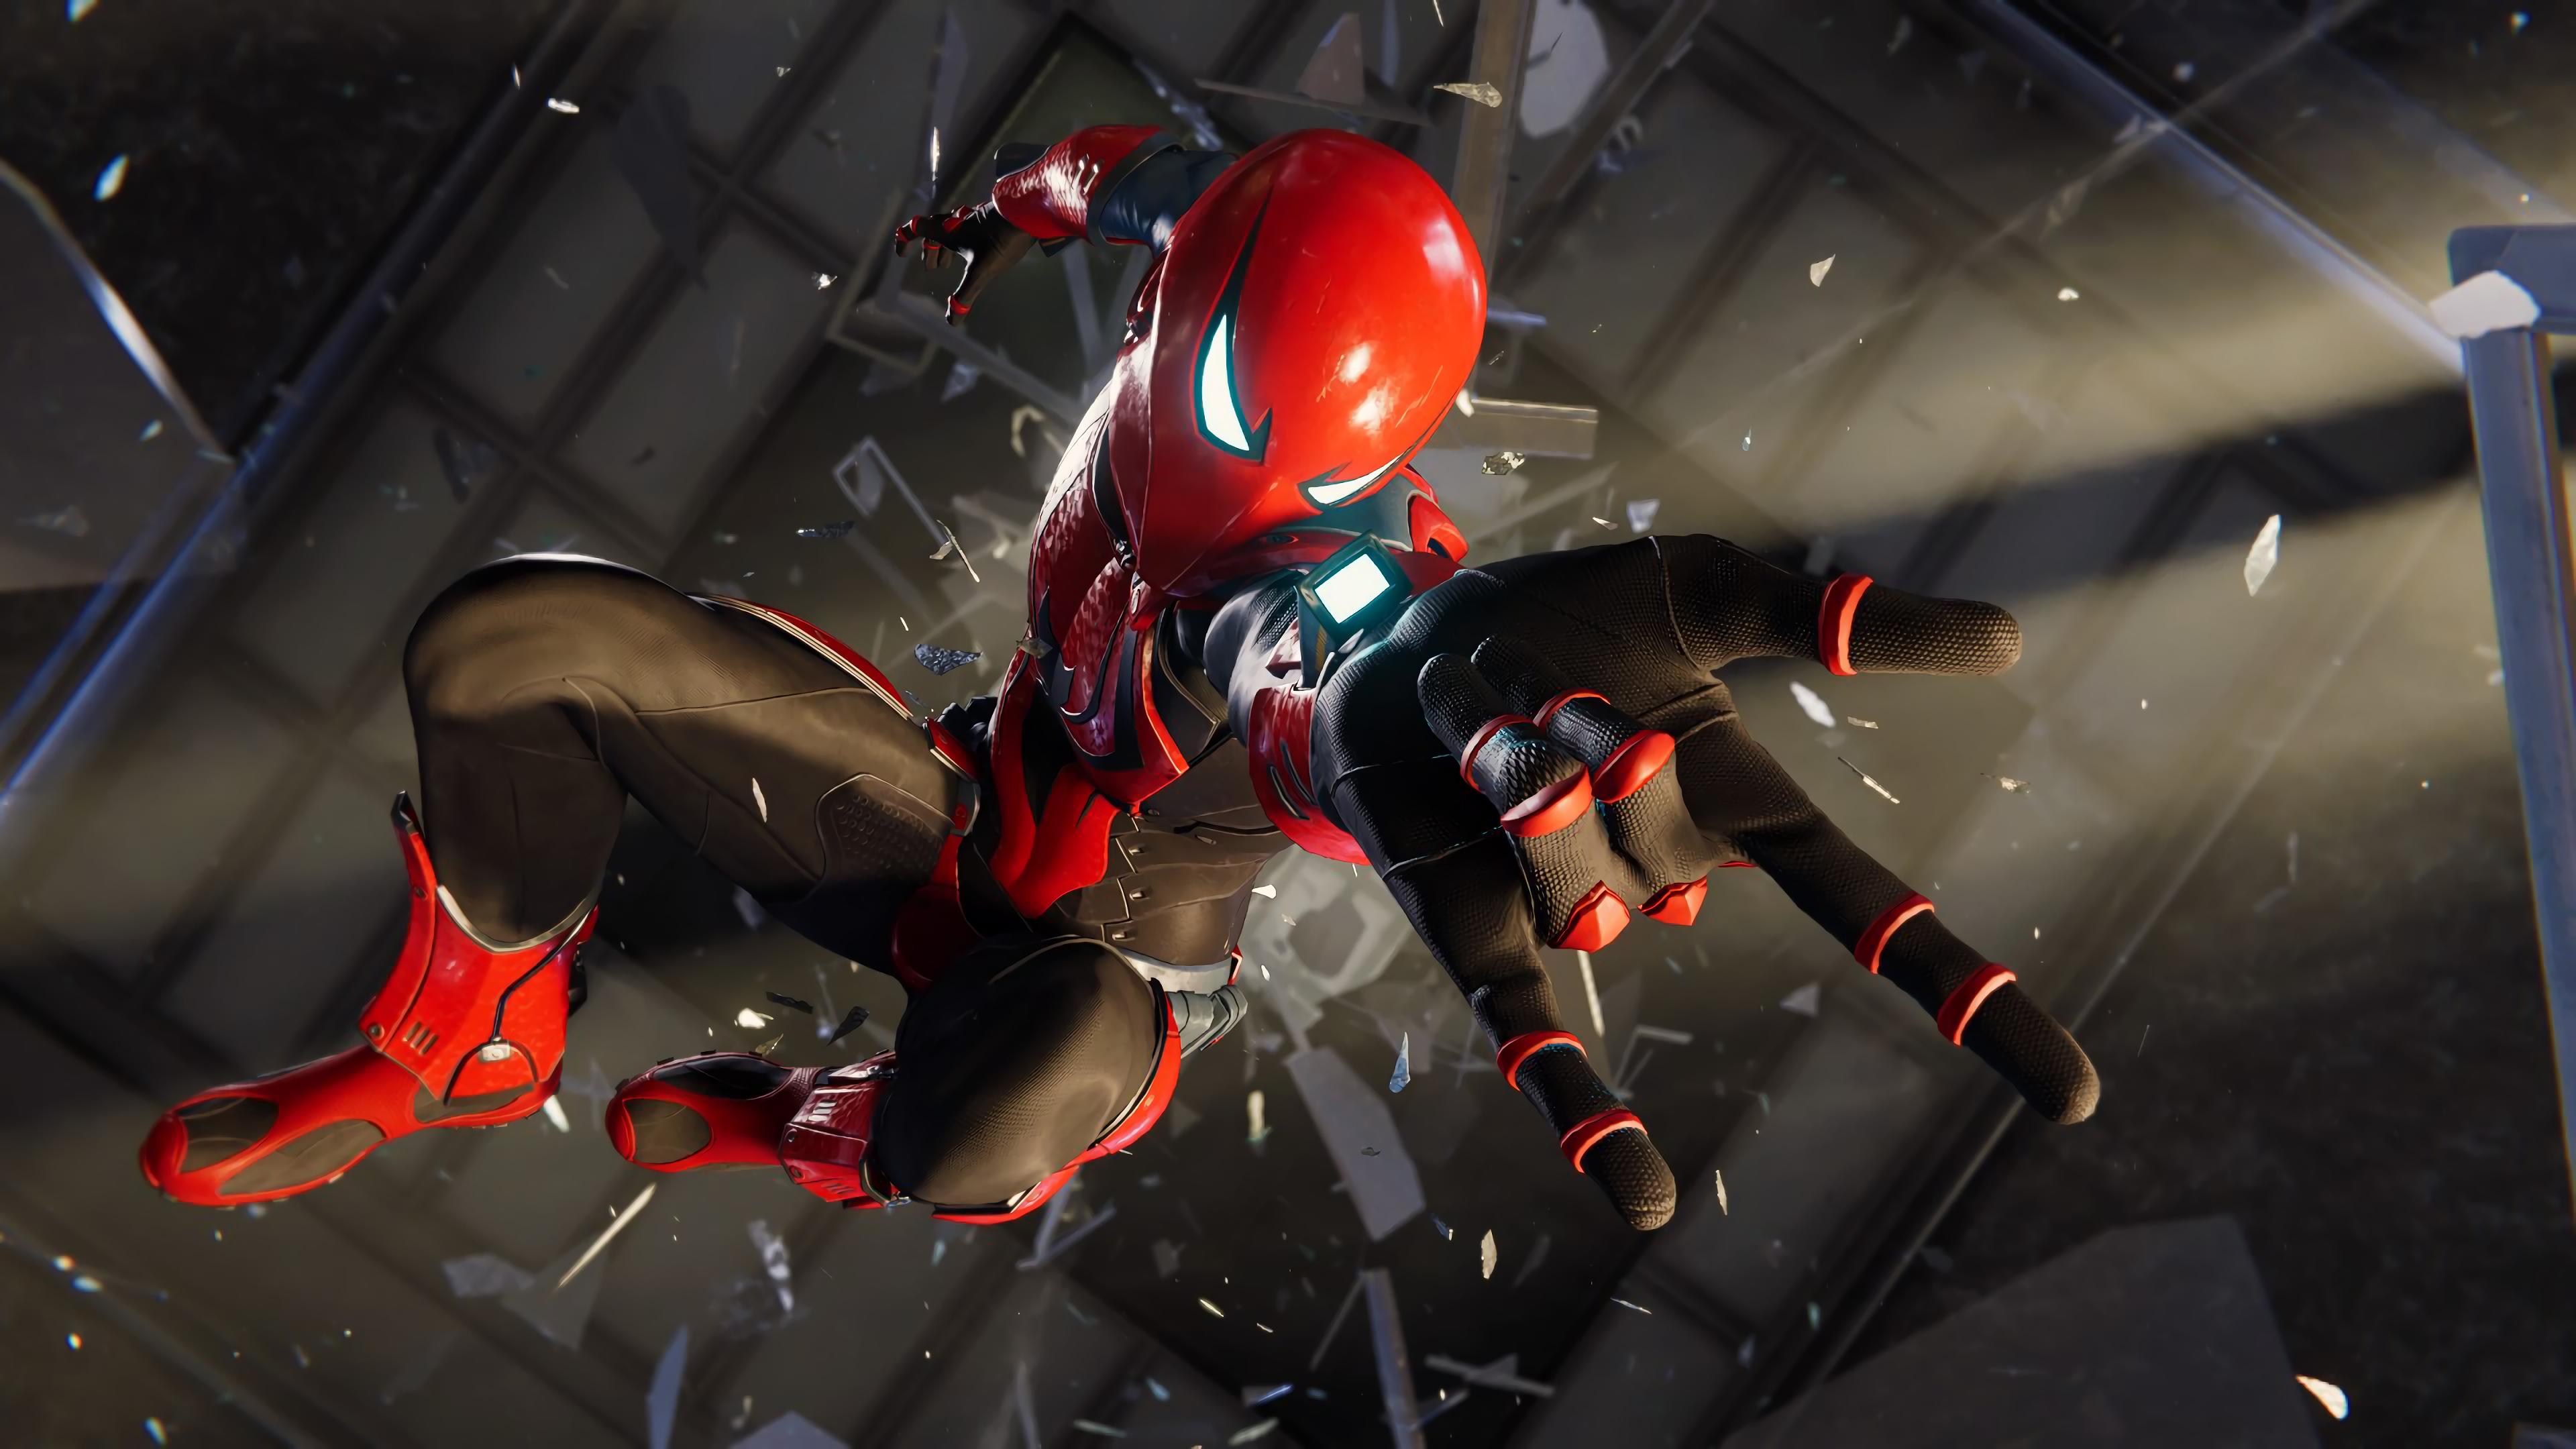 3840x2160 Spiderman MK 3 4K 4k HD 4k Wallpapers, Images ...